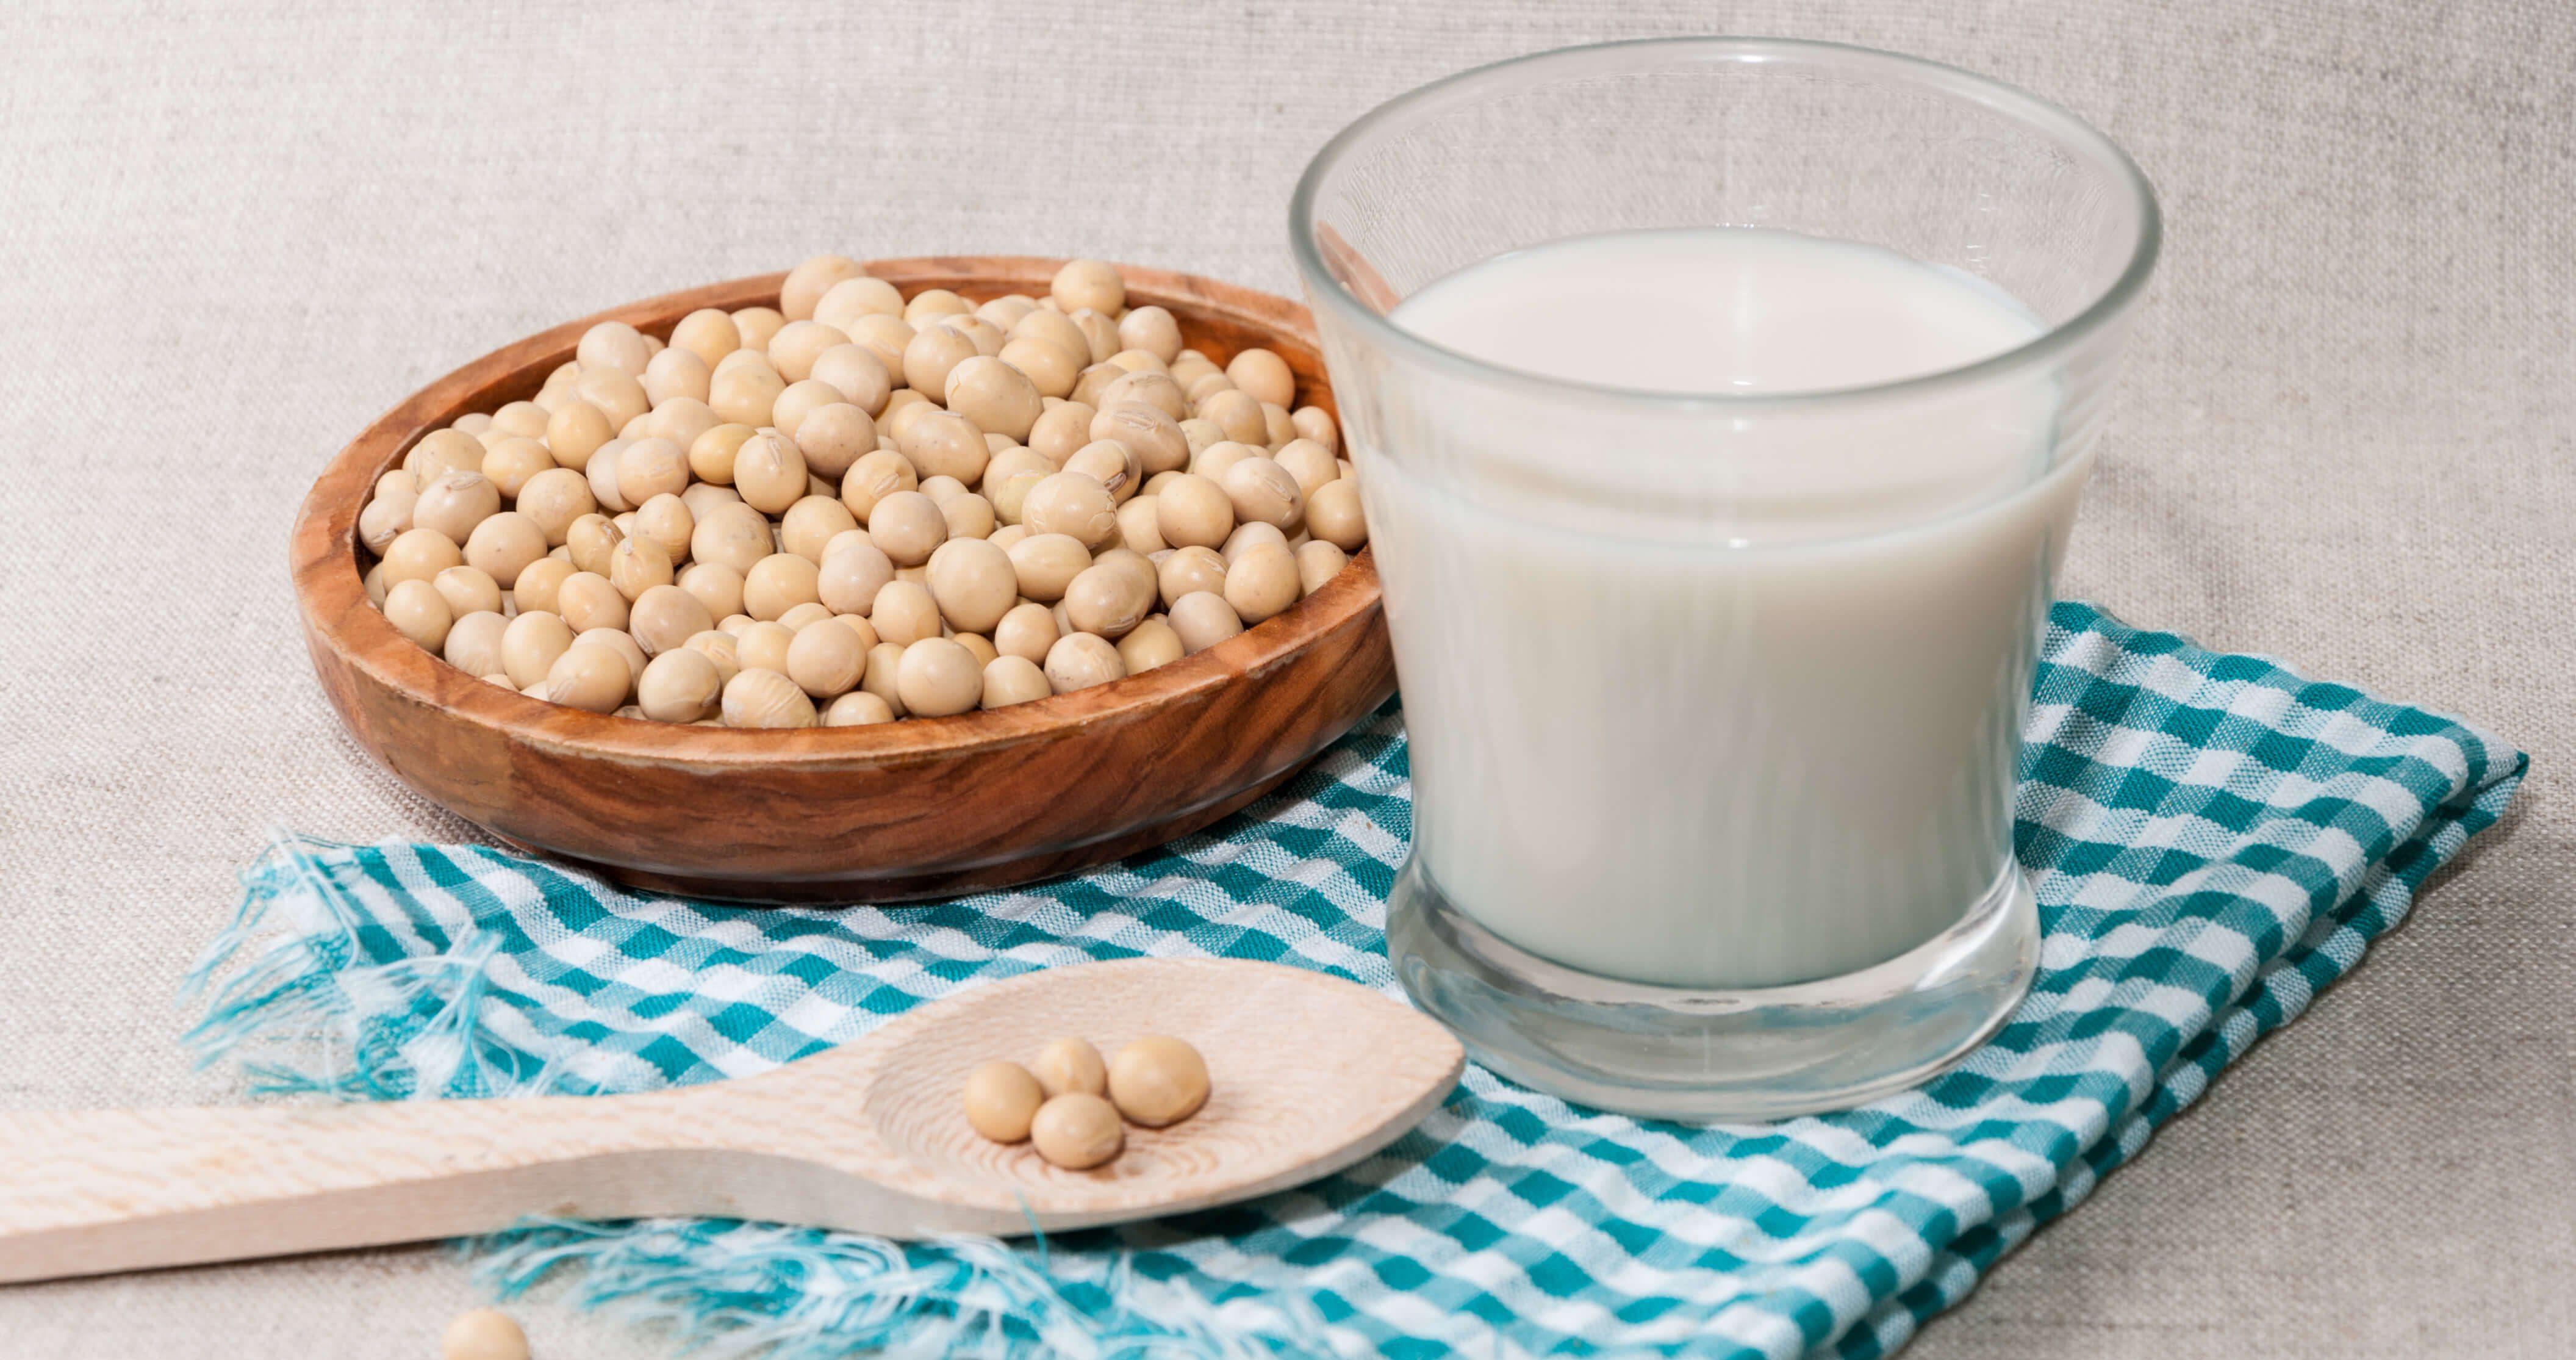 Plant-based milk